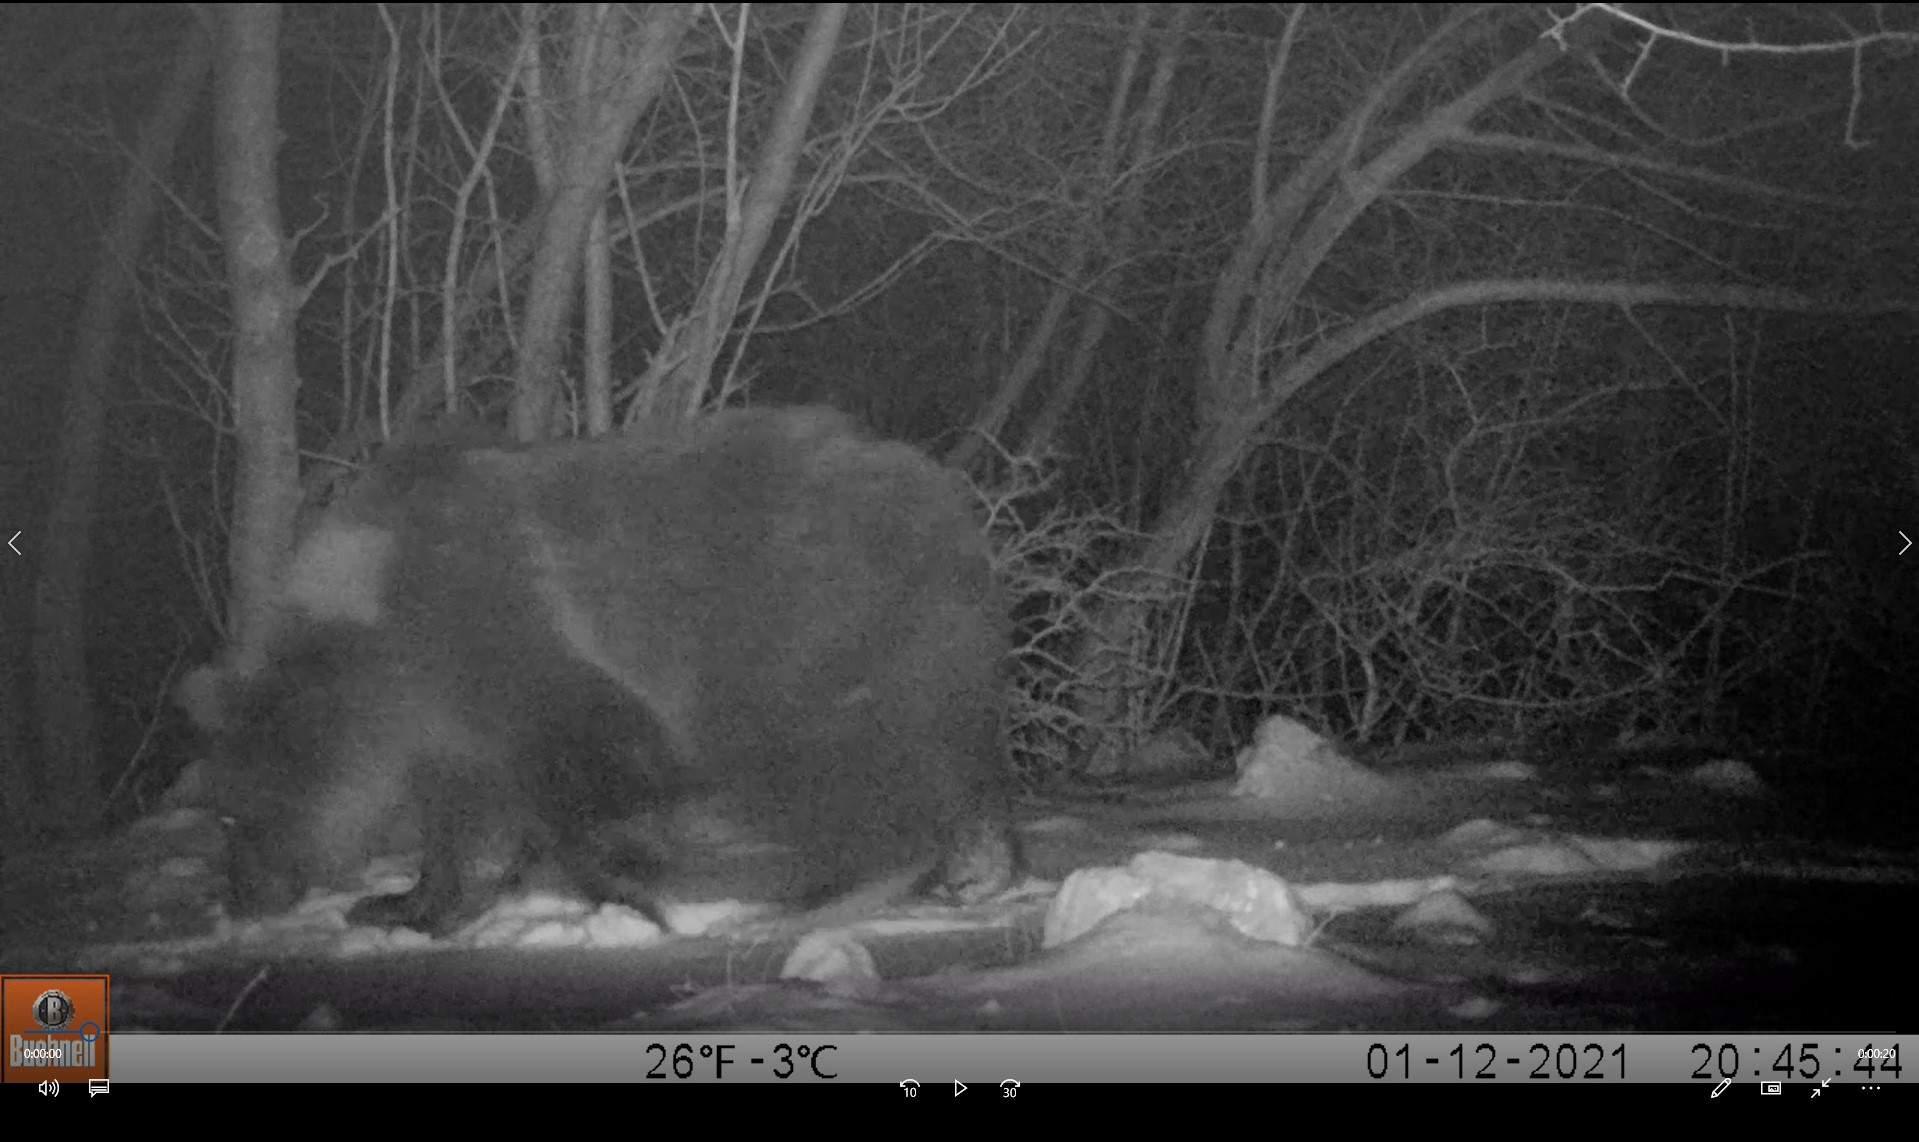 Snimak medvjeda sa foto-zamke (JU Priroda)